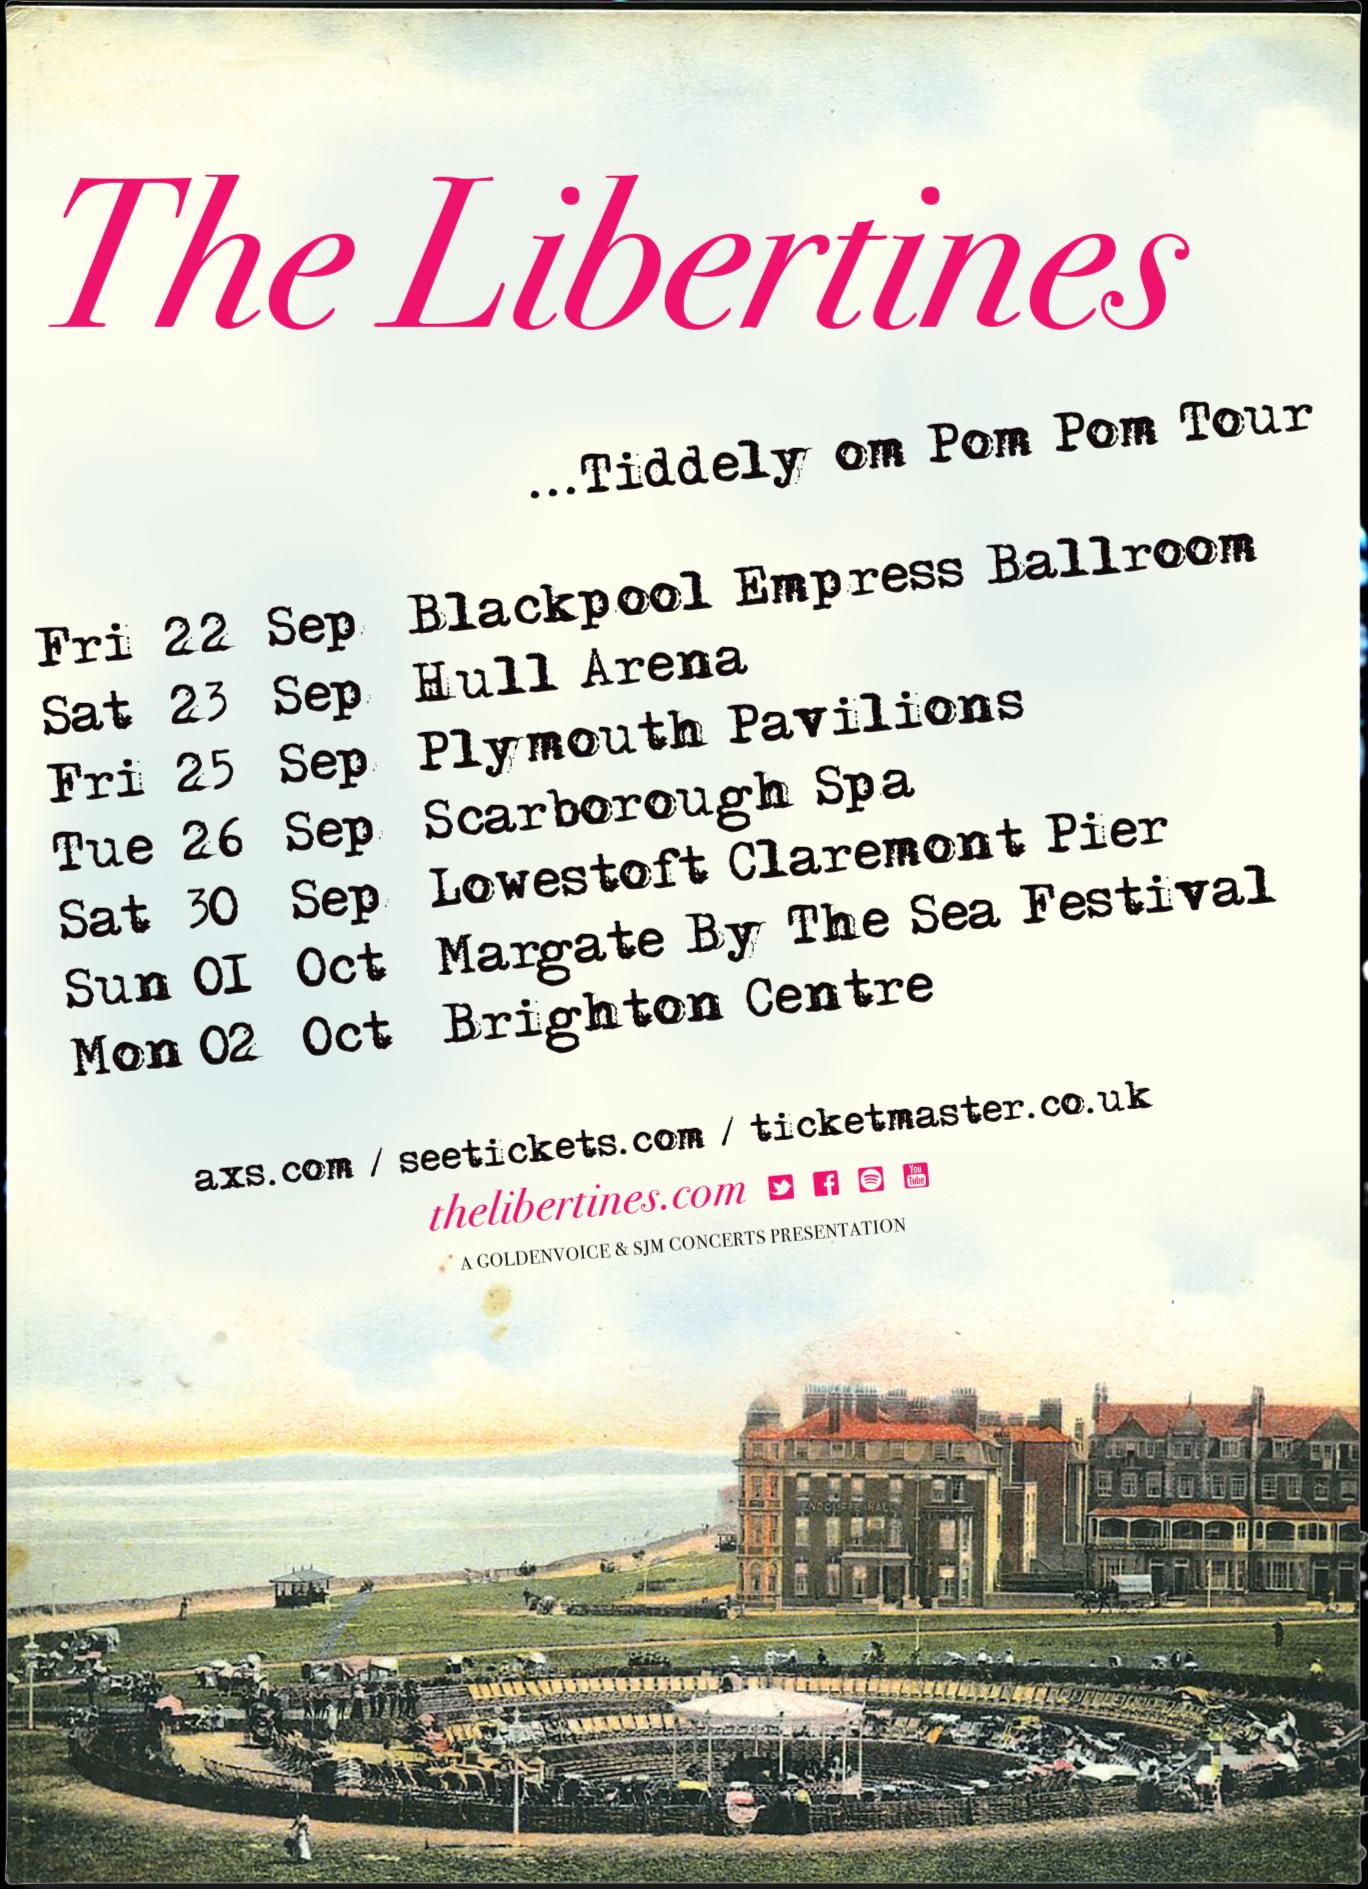 Tiddely Om Pom Pom Poster (SALE) - The Libertines